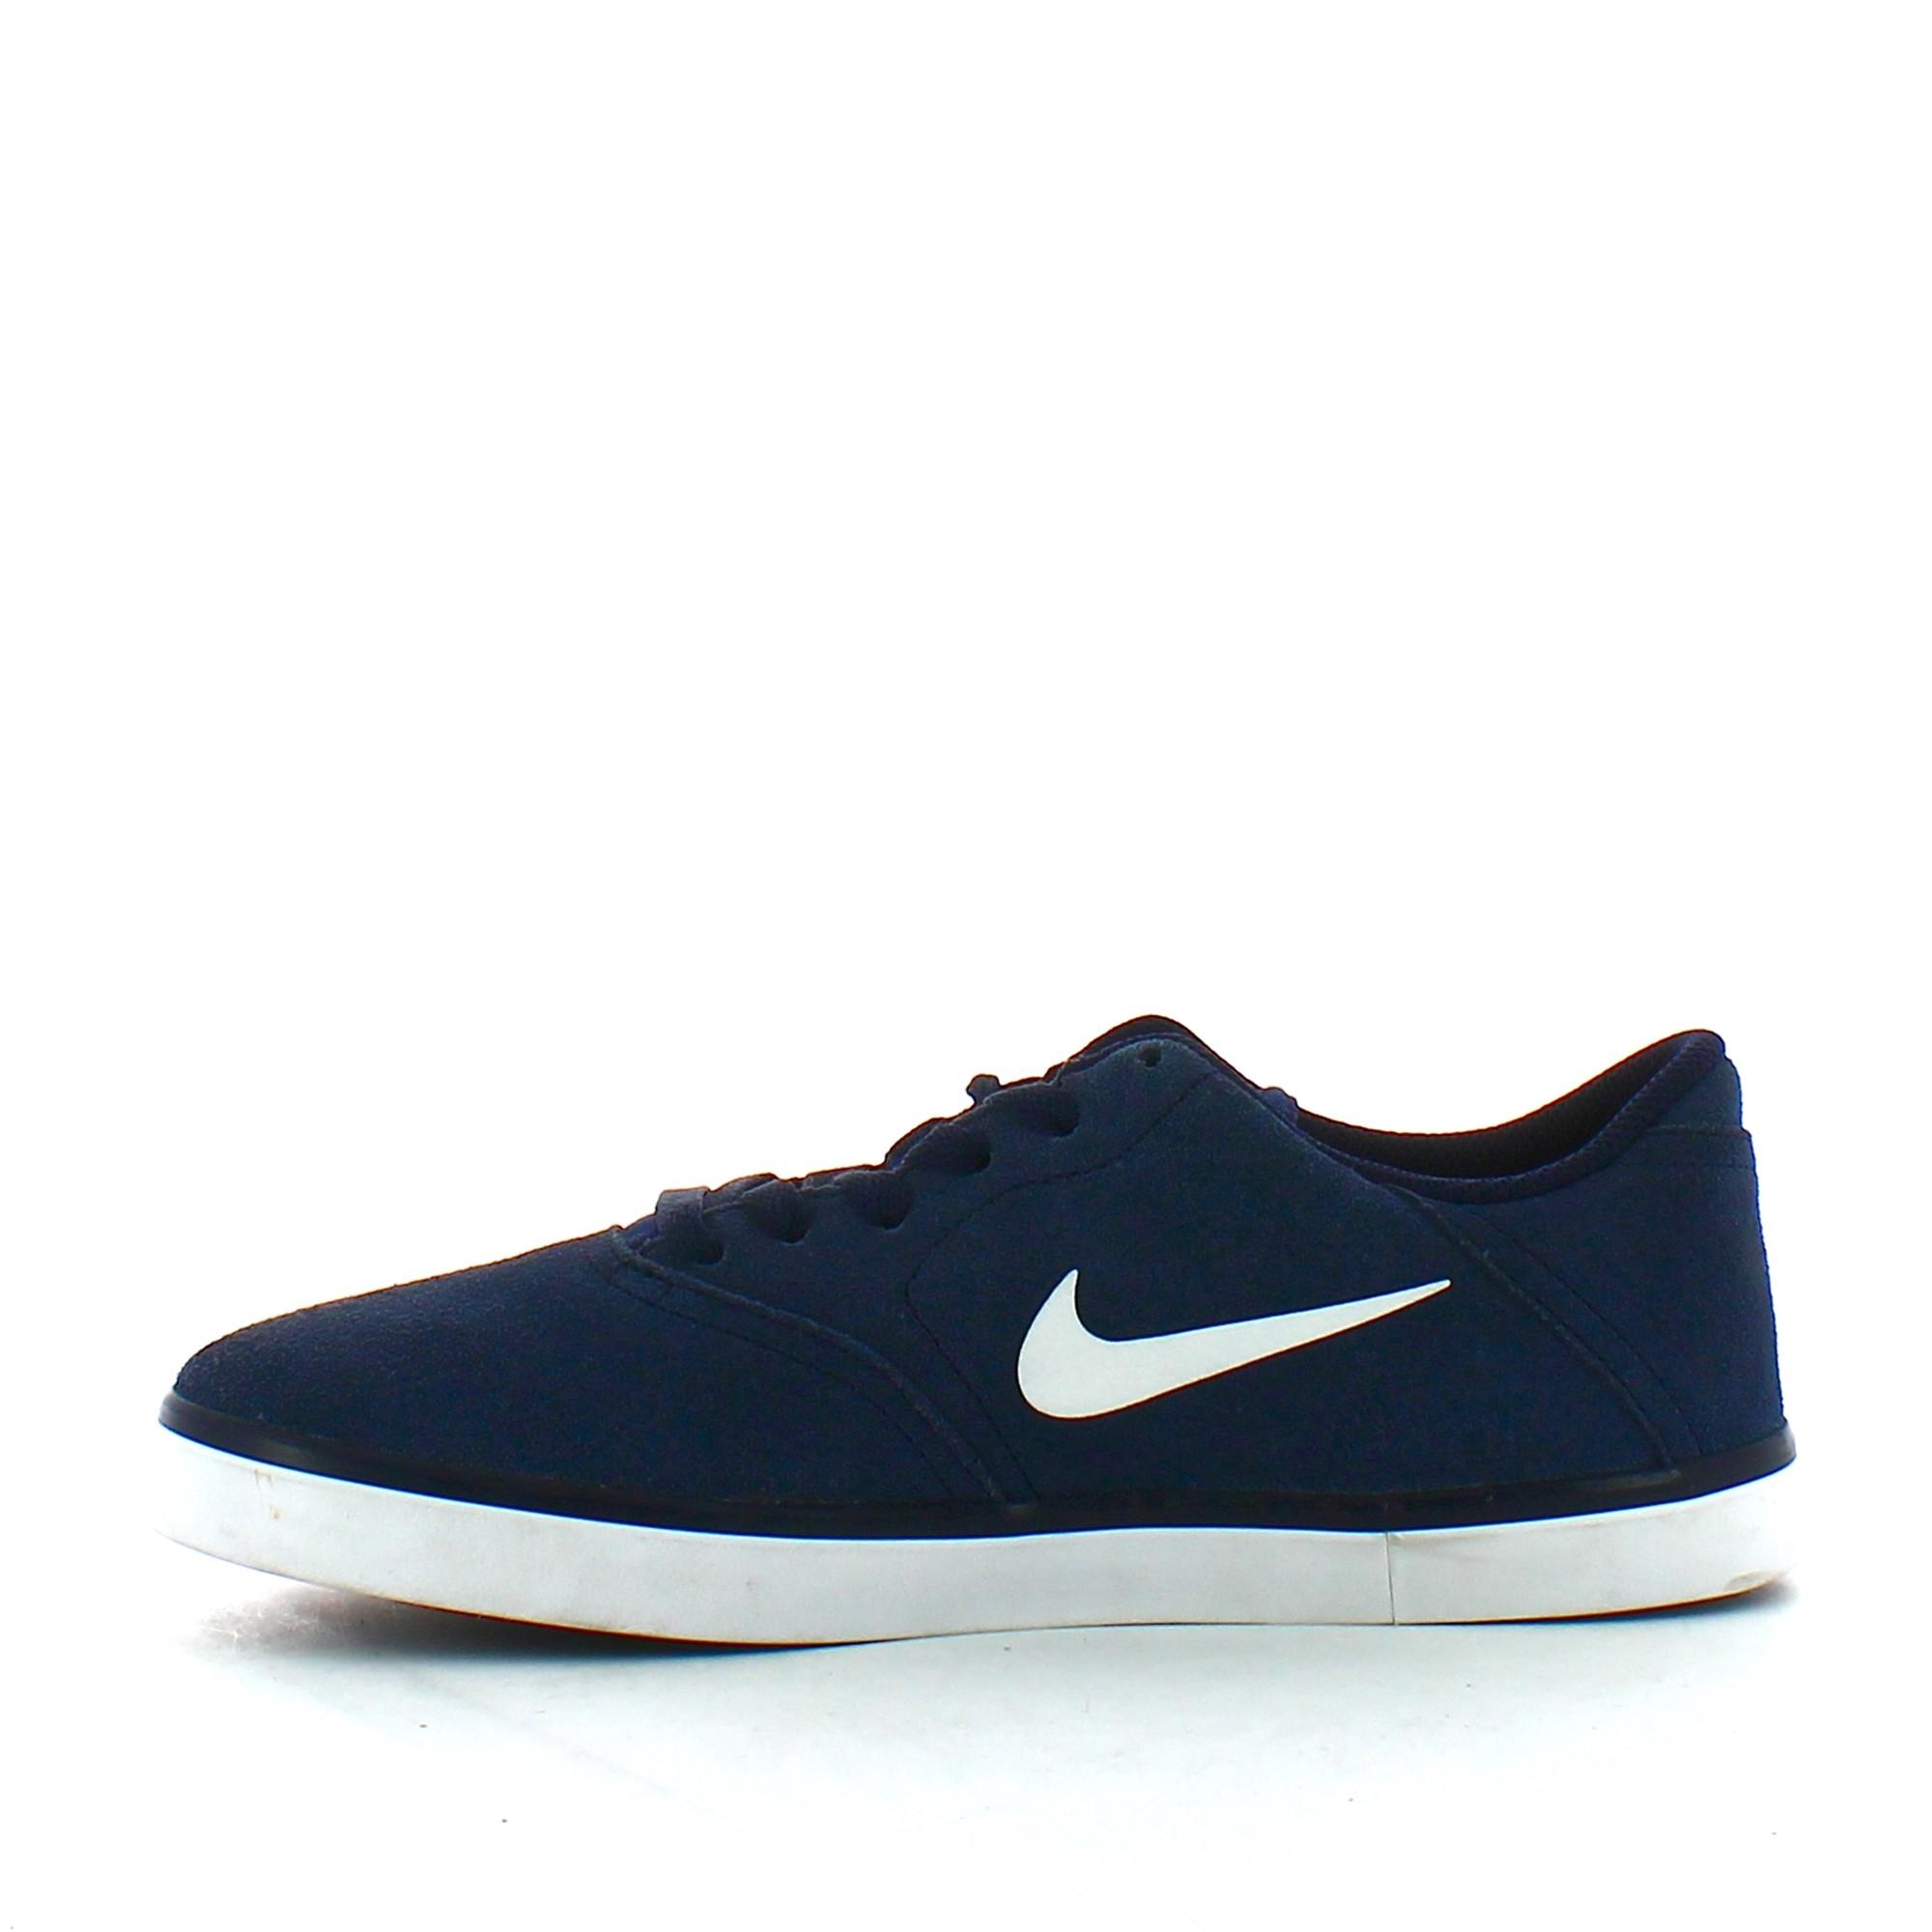 info for fa519 84588 Comprar Nike Sb Check 705265 410 Online - Deportes Moya